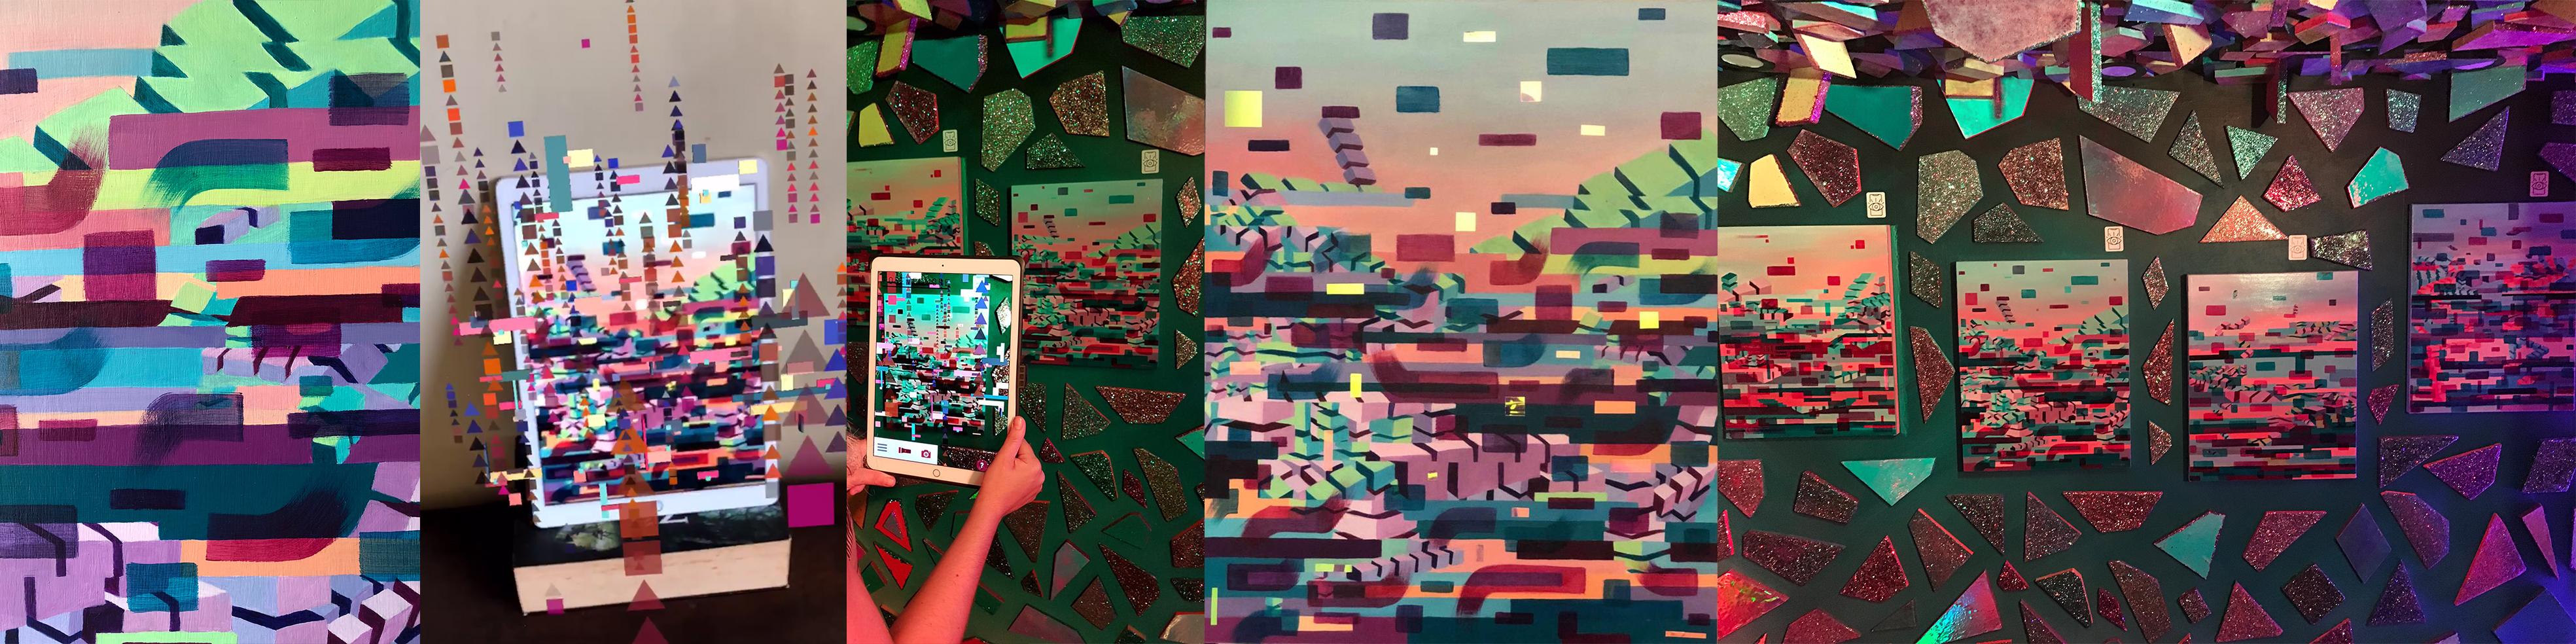 Artist in studio creative art process, Augmented Reality Art exhibition